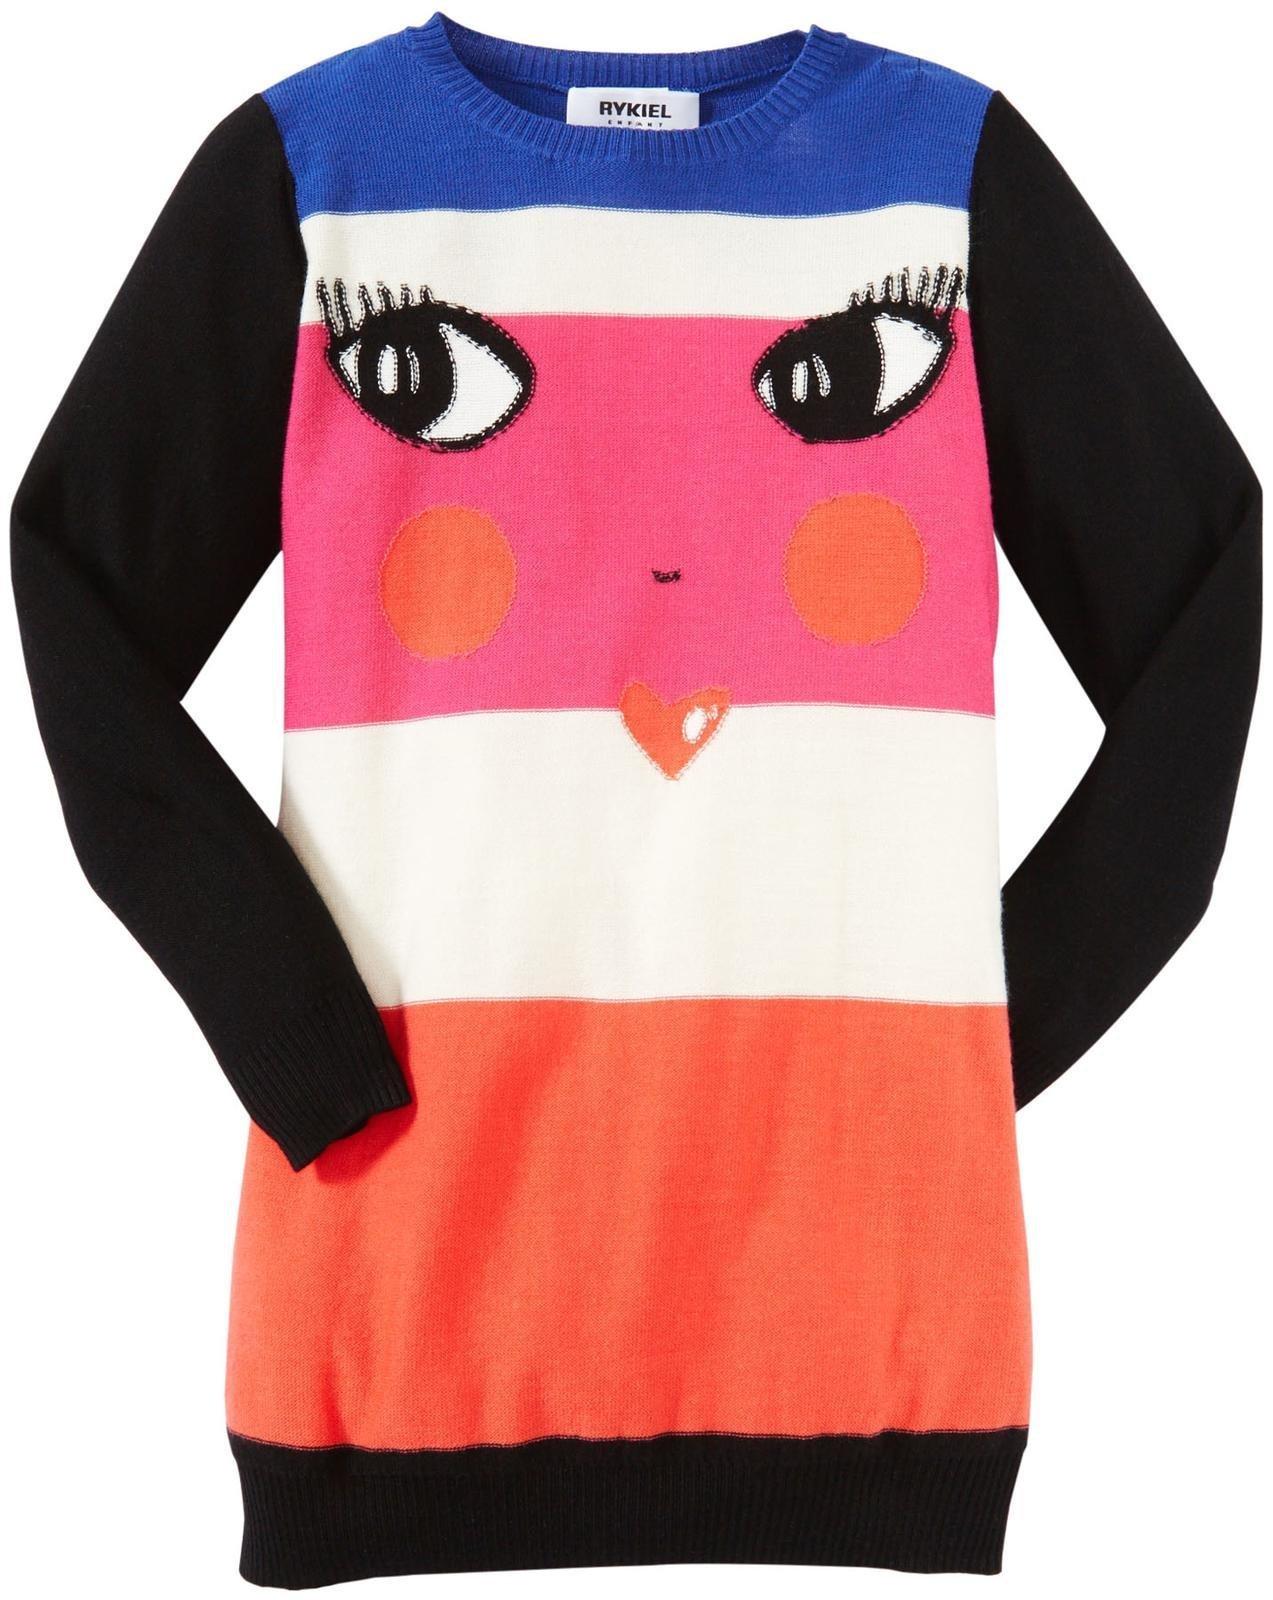 Sonia Rykiel Enfant Little Girls' Sweater Dress (Toddler/Kid) - Multicolor - 4